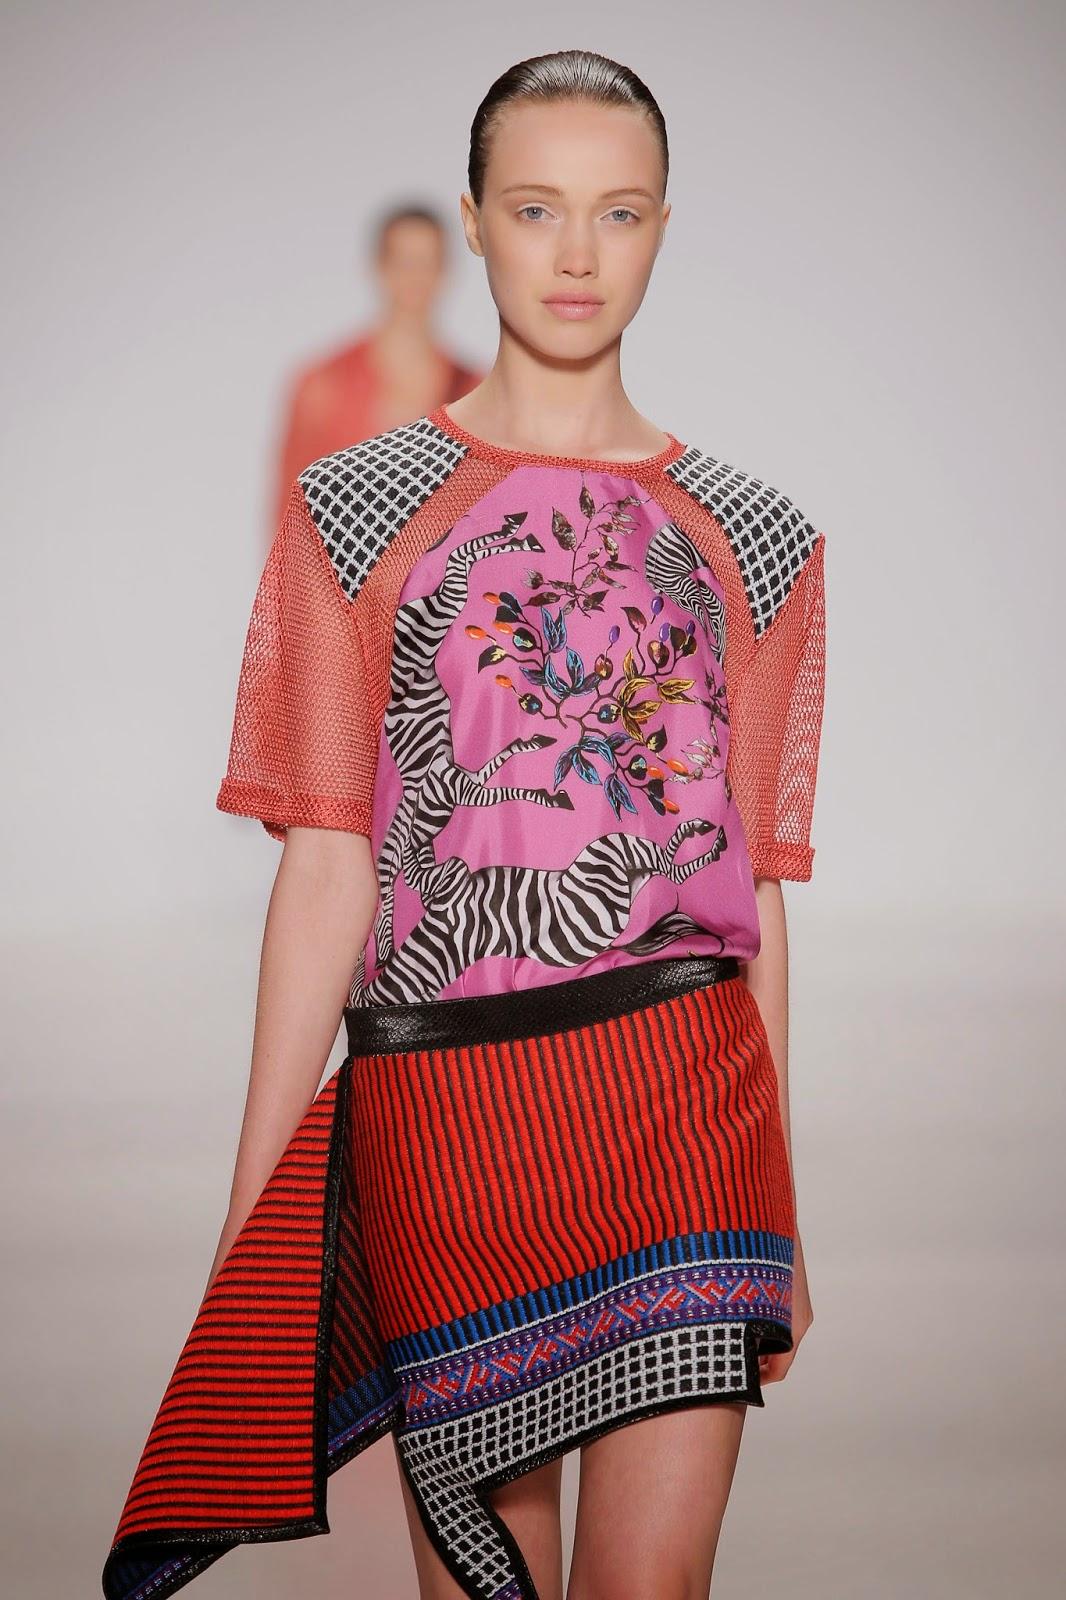 0ed8d502d0b Fashion Studio Magazine: MERCEDES-BENZ FASHION WEEK NEW YORK: Custo ...